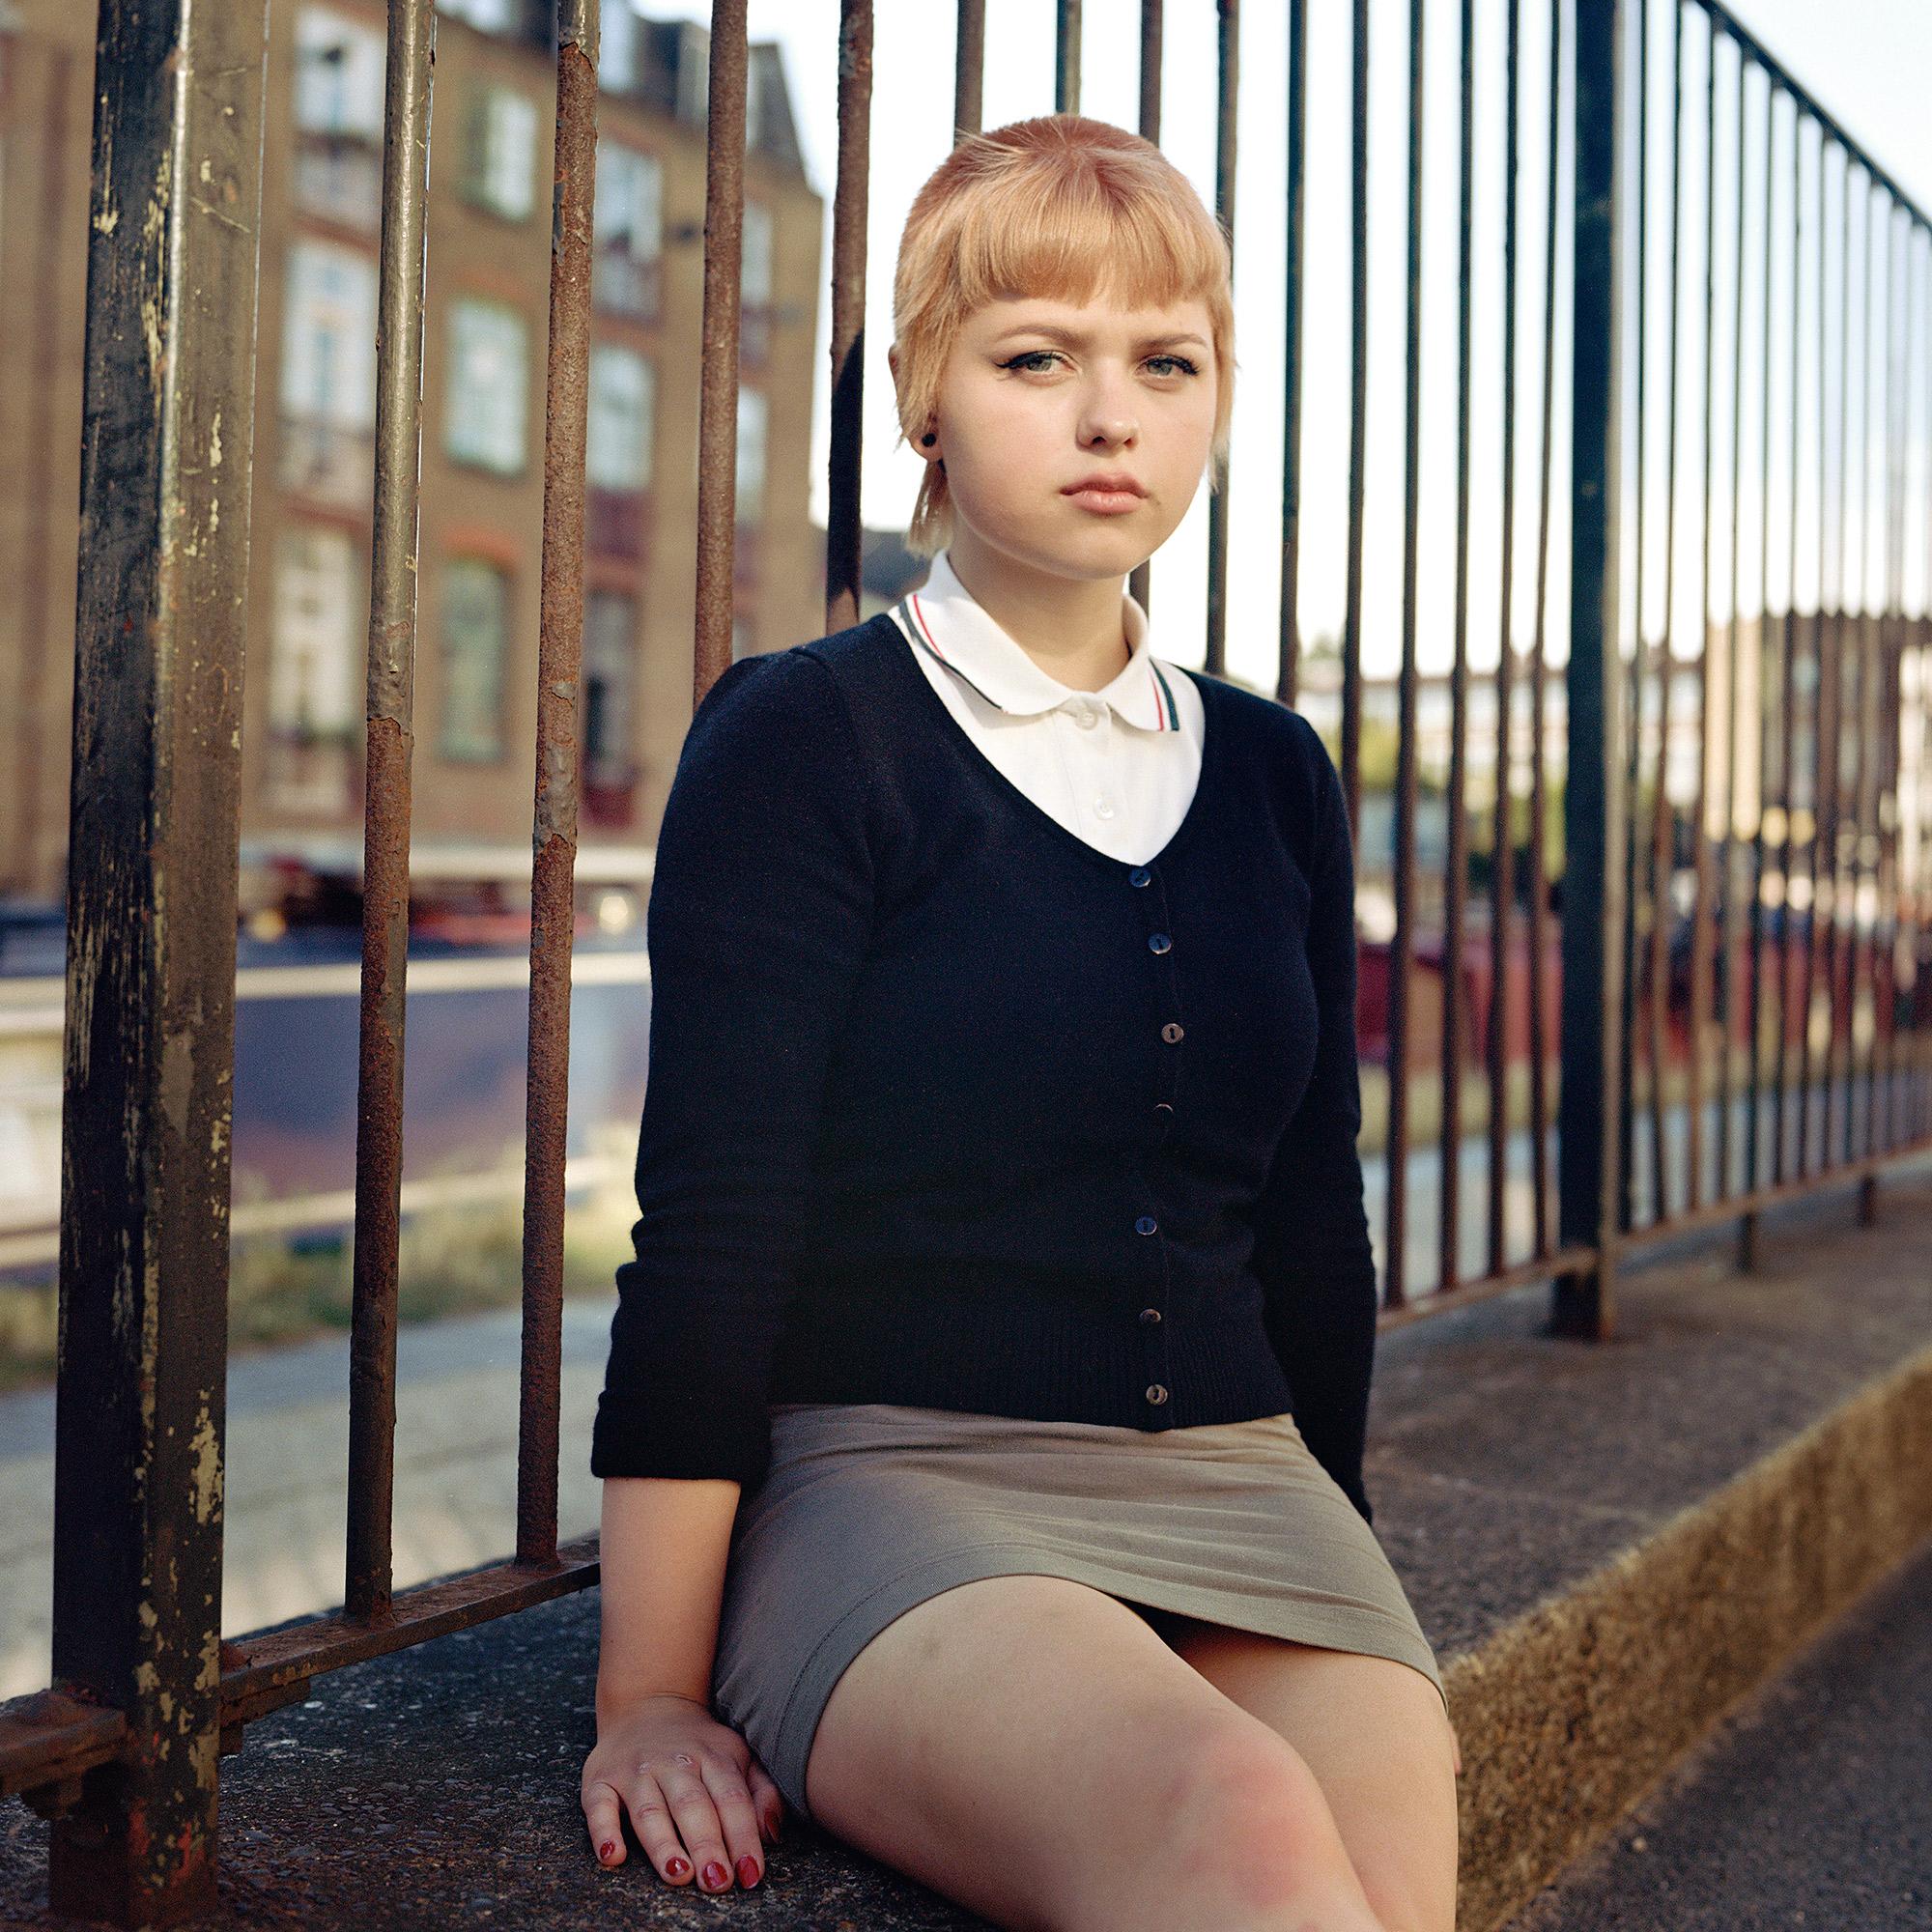 medium format analog color portrait of a skinhead girl in London, UK by Owen Harvey